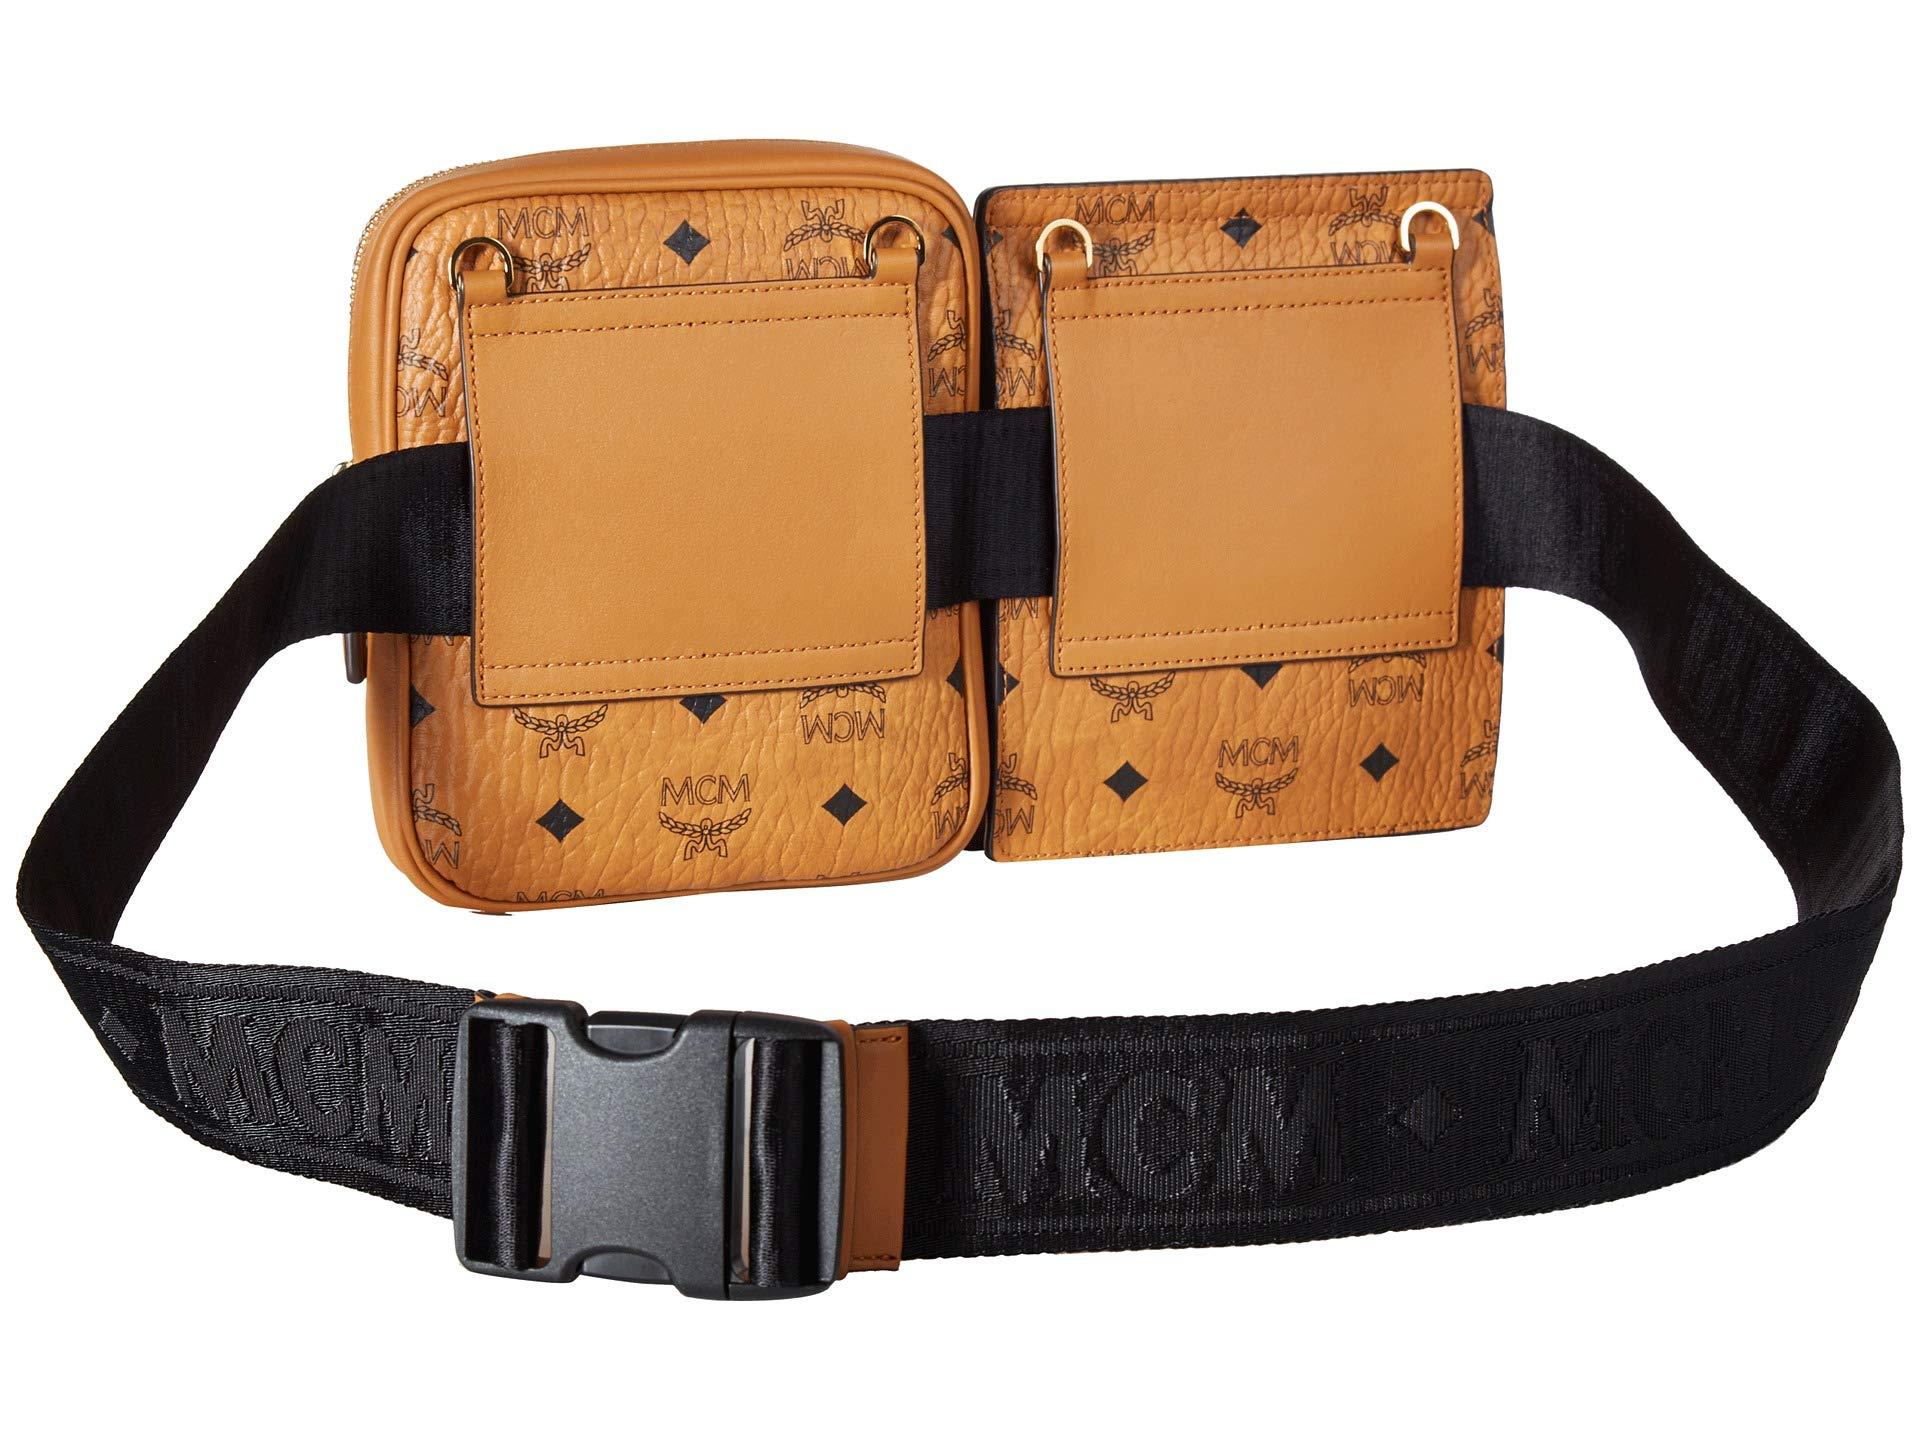 fda600039c9f MCM MCM Stark Double Logo Belt Bag at Luxury.Zappos.com